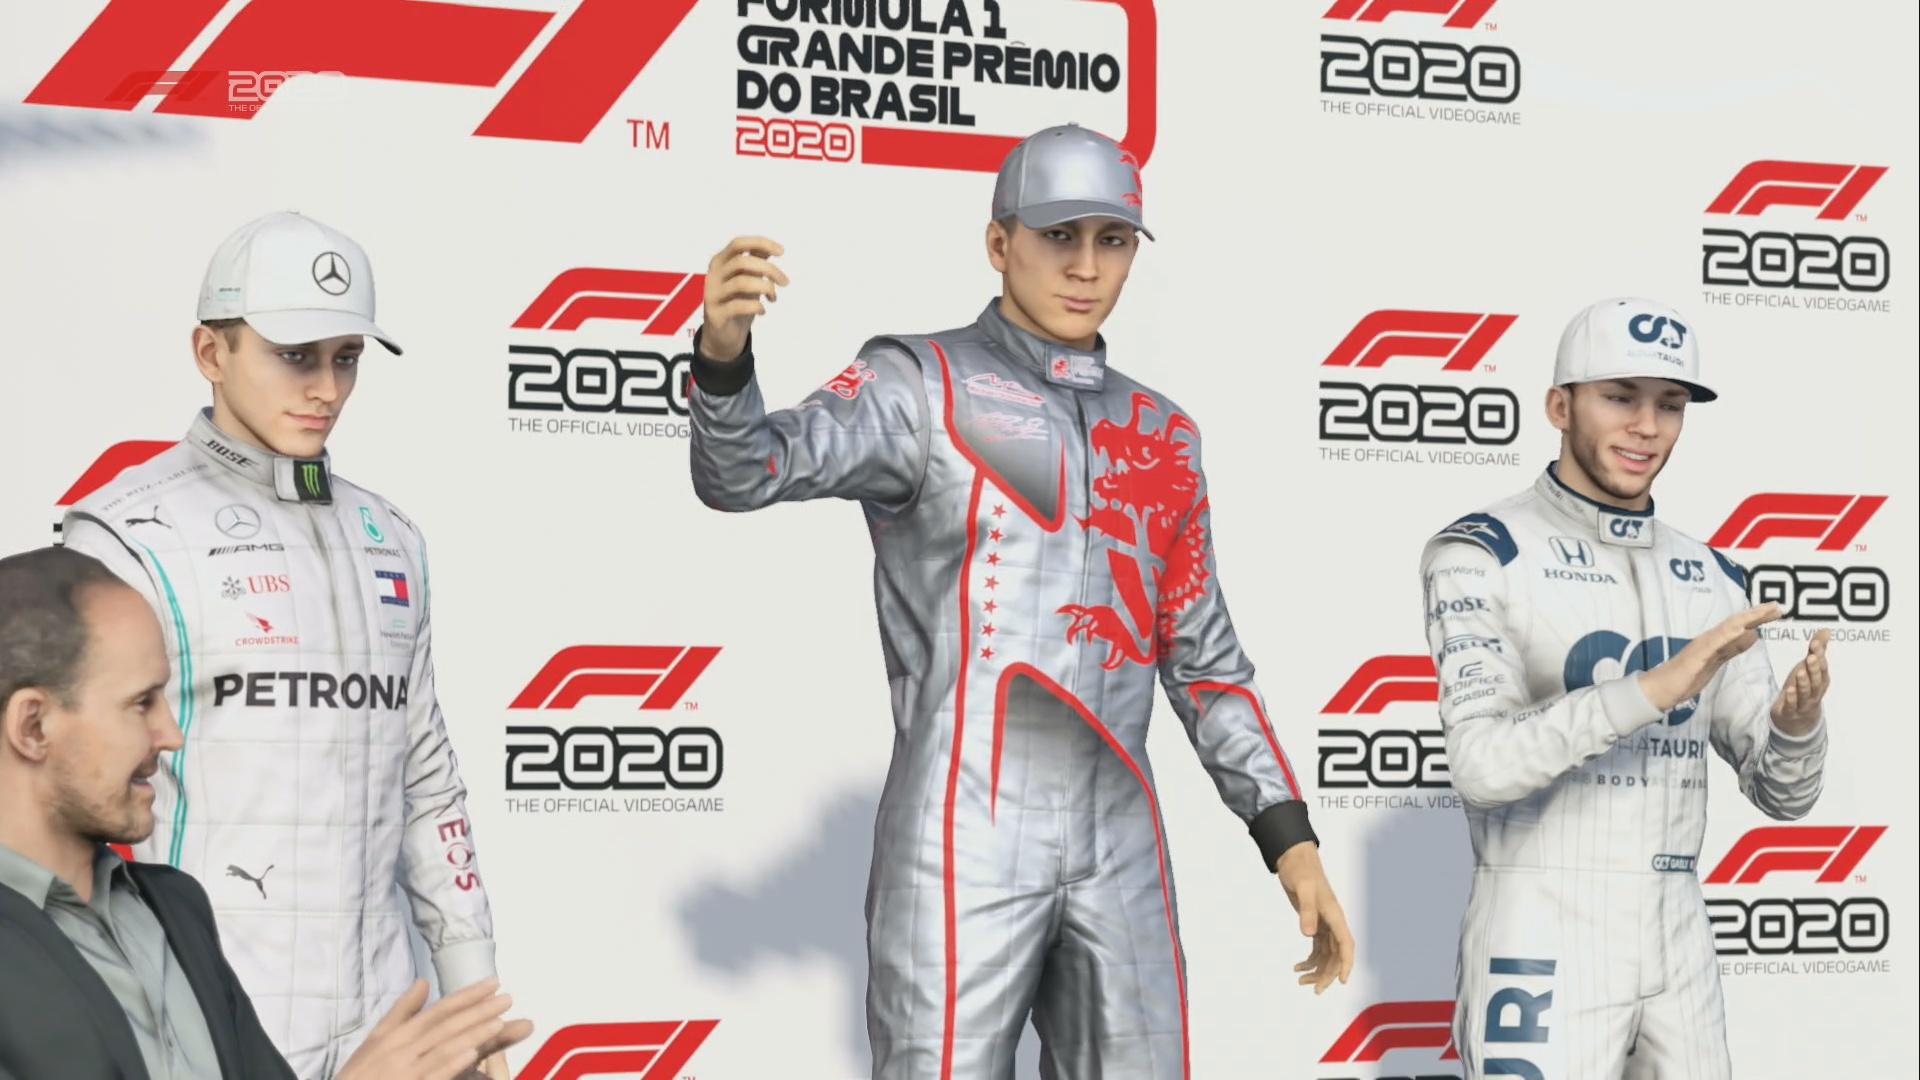 F1 2020 Aitken And Leclerc